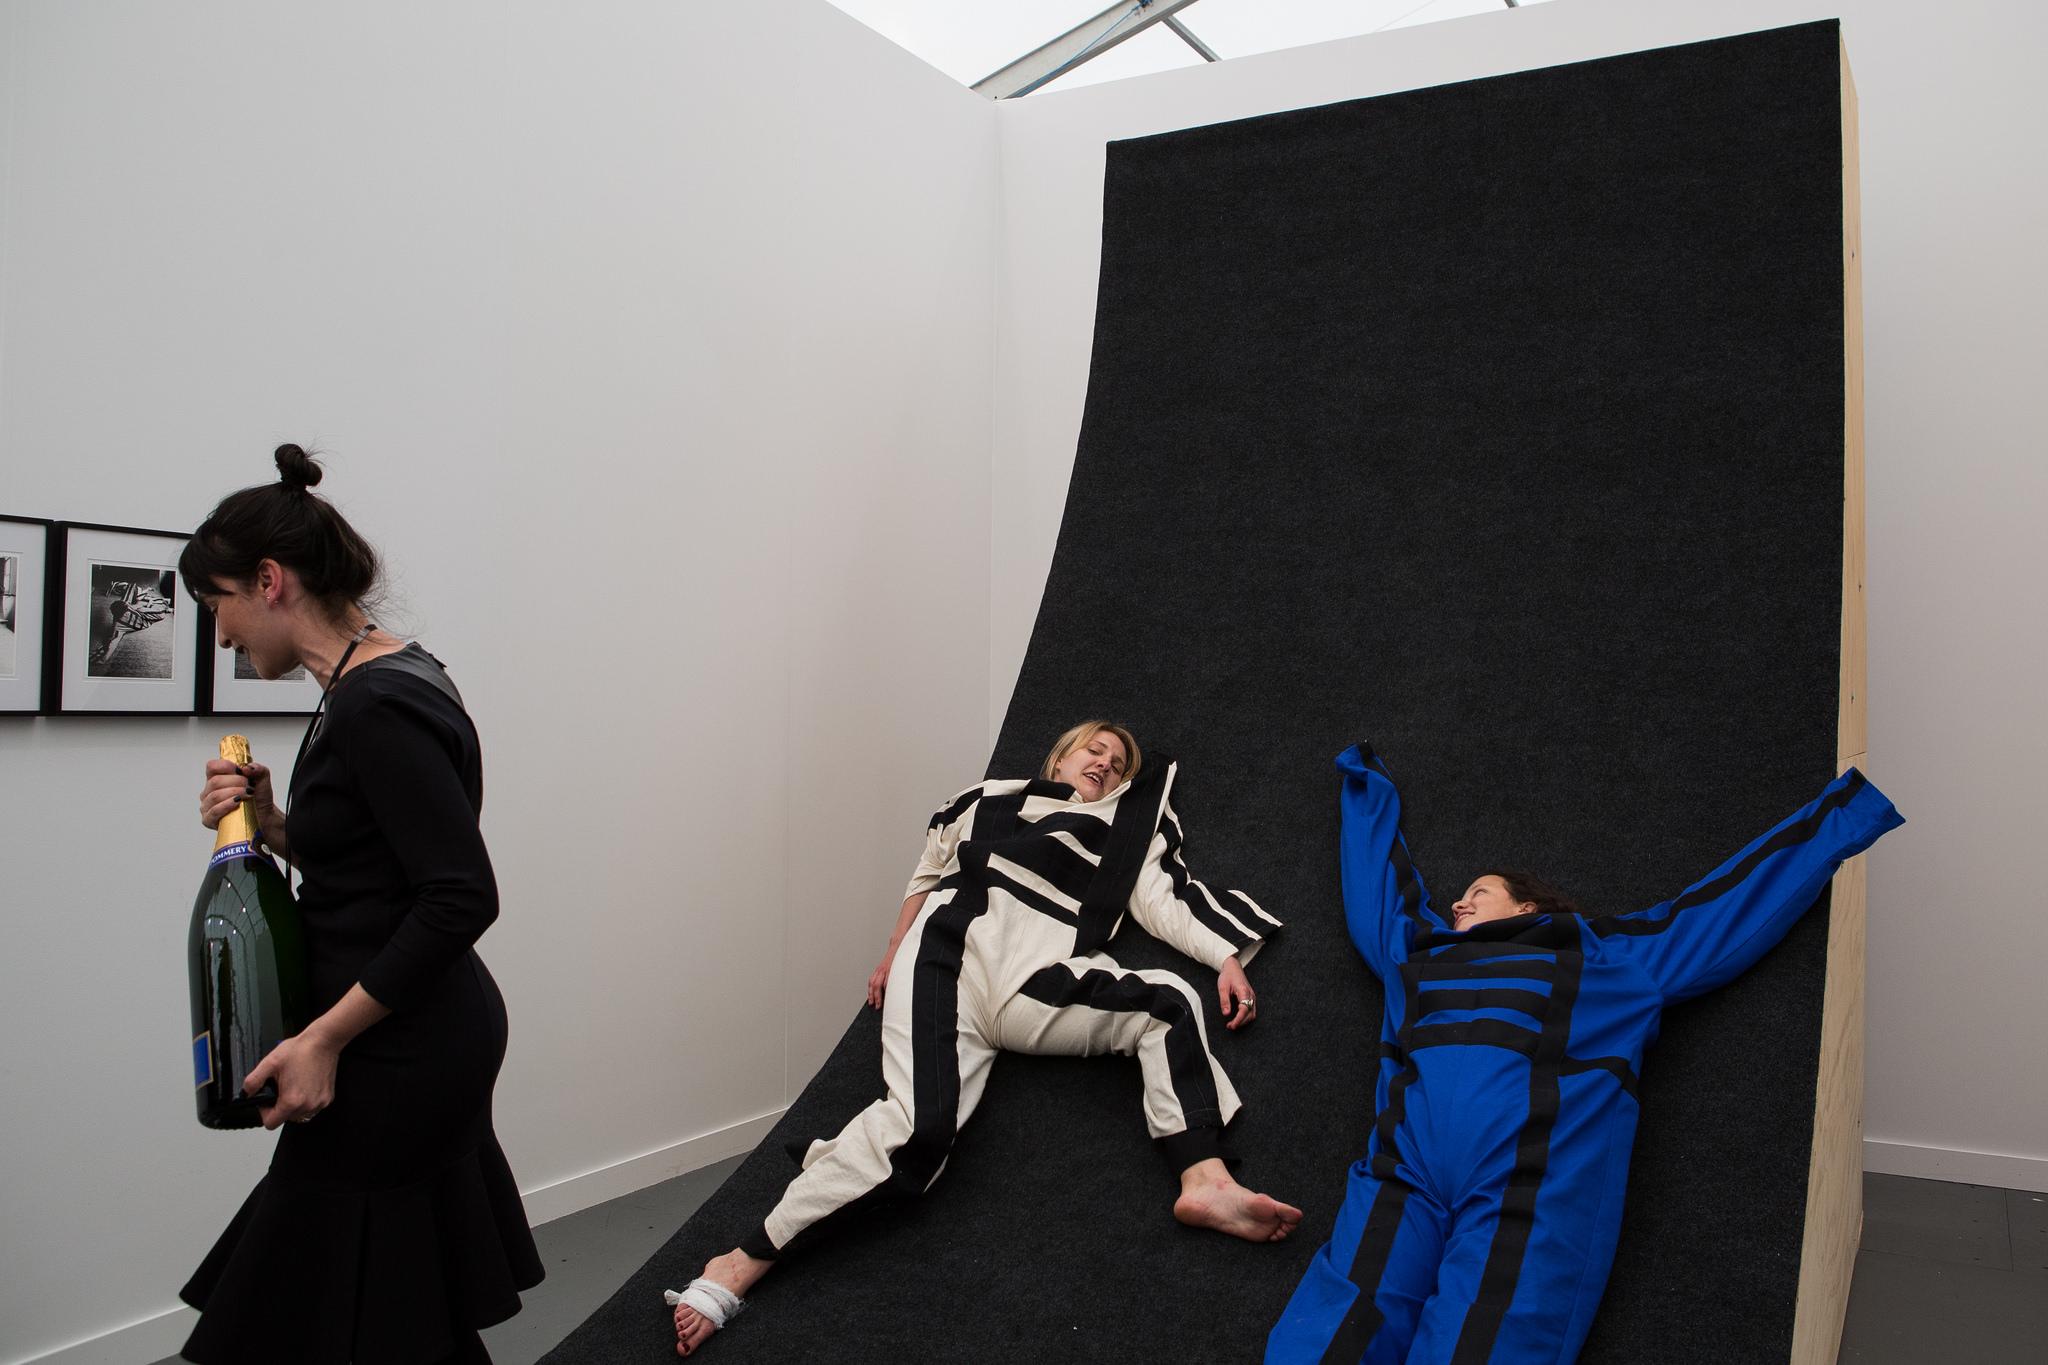 Stand Prize: Galeria Jaqueline Martins, Frieze New York 2015. Photograph by Marco Scozzaro. Courtesy of Marco Scozzaro/Frieze.